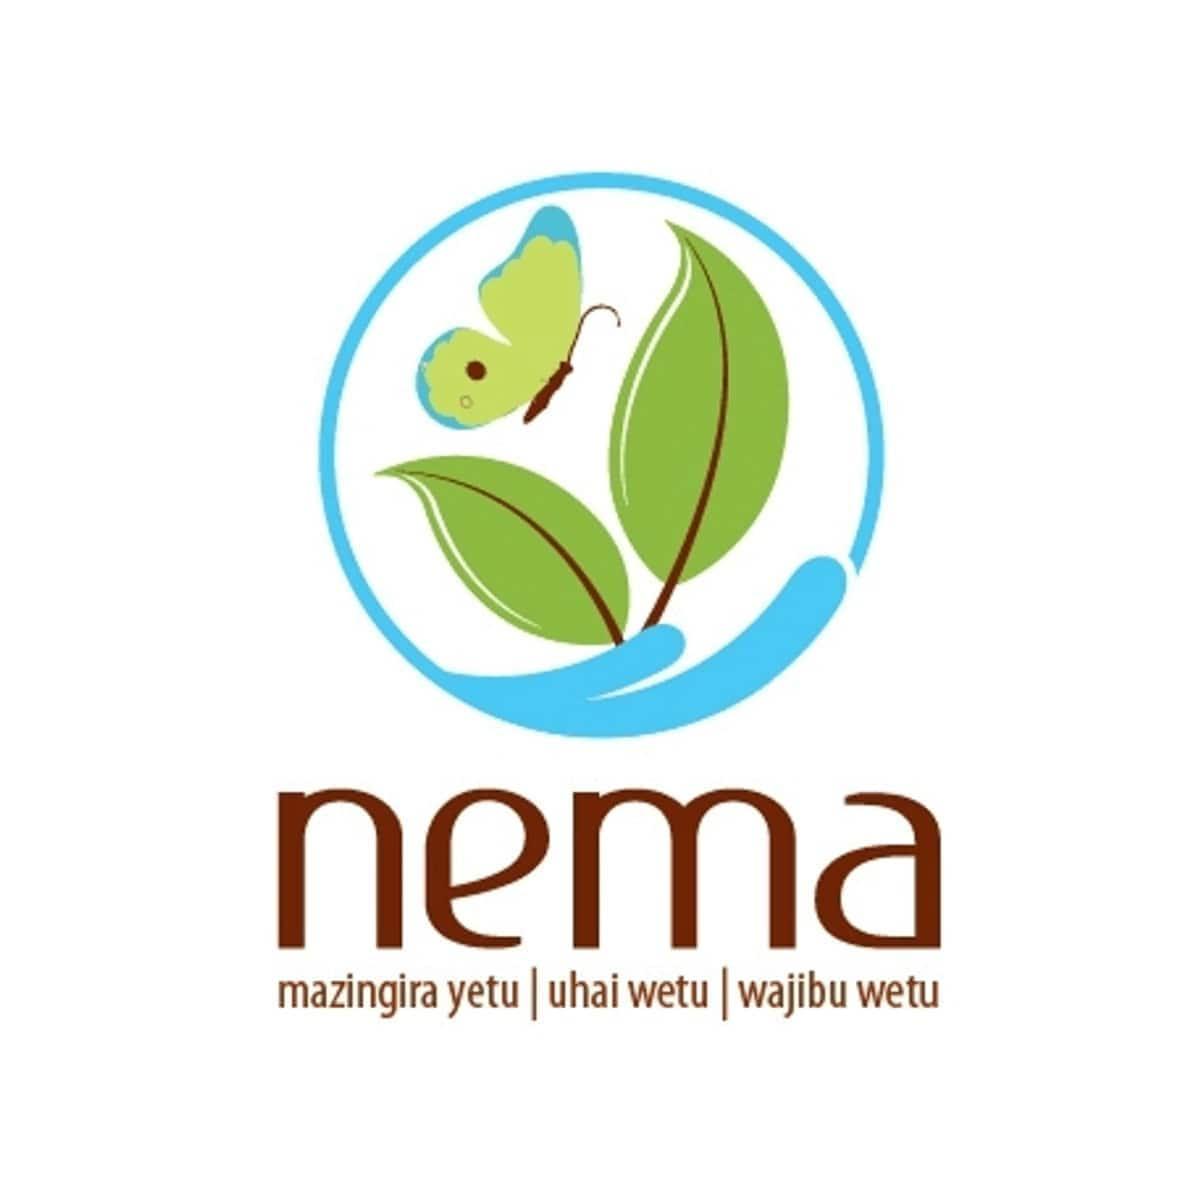 nema tribunal kenya contacts, director general nema kenya contacts, national environment management authority contacts